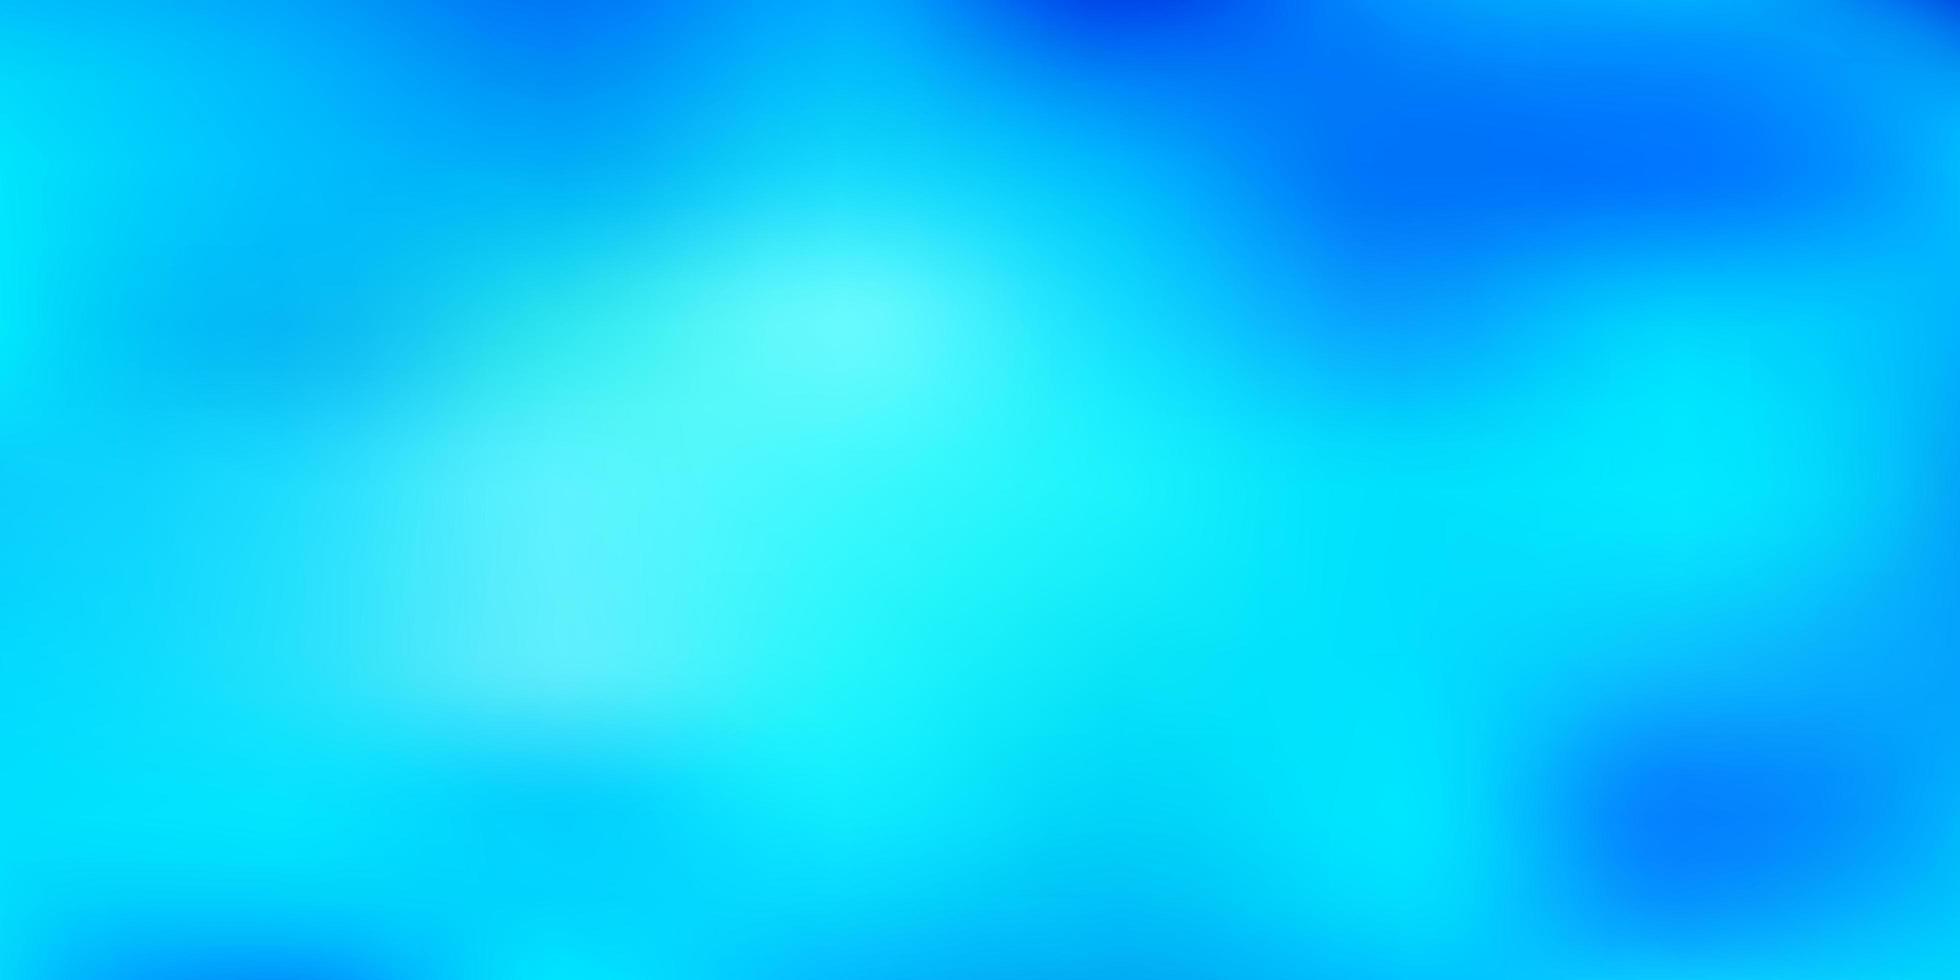 patrón de desenfoque abstracto de vector azul claro.